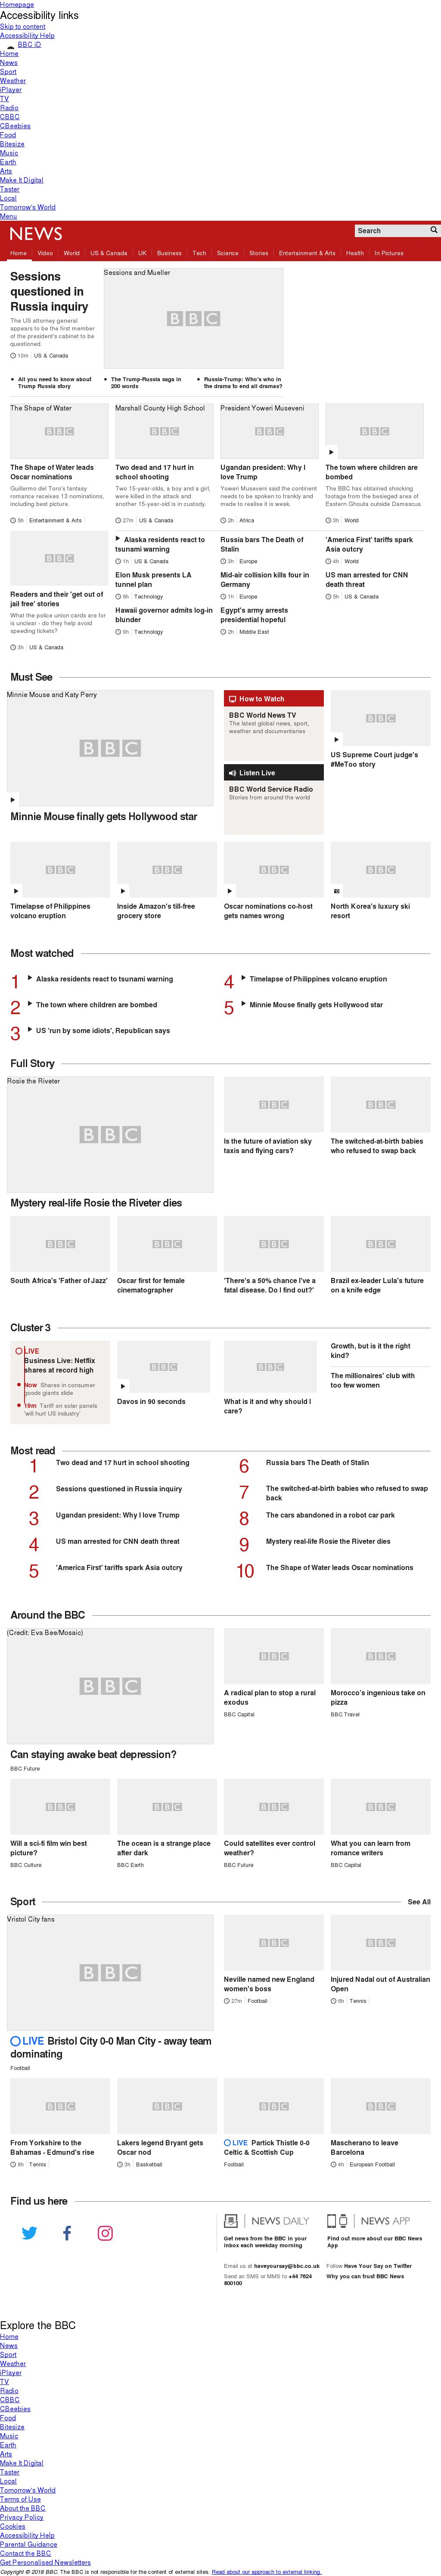 BBC at Tuesday Jan. 23, 2018, 8 p.m. UTC